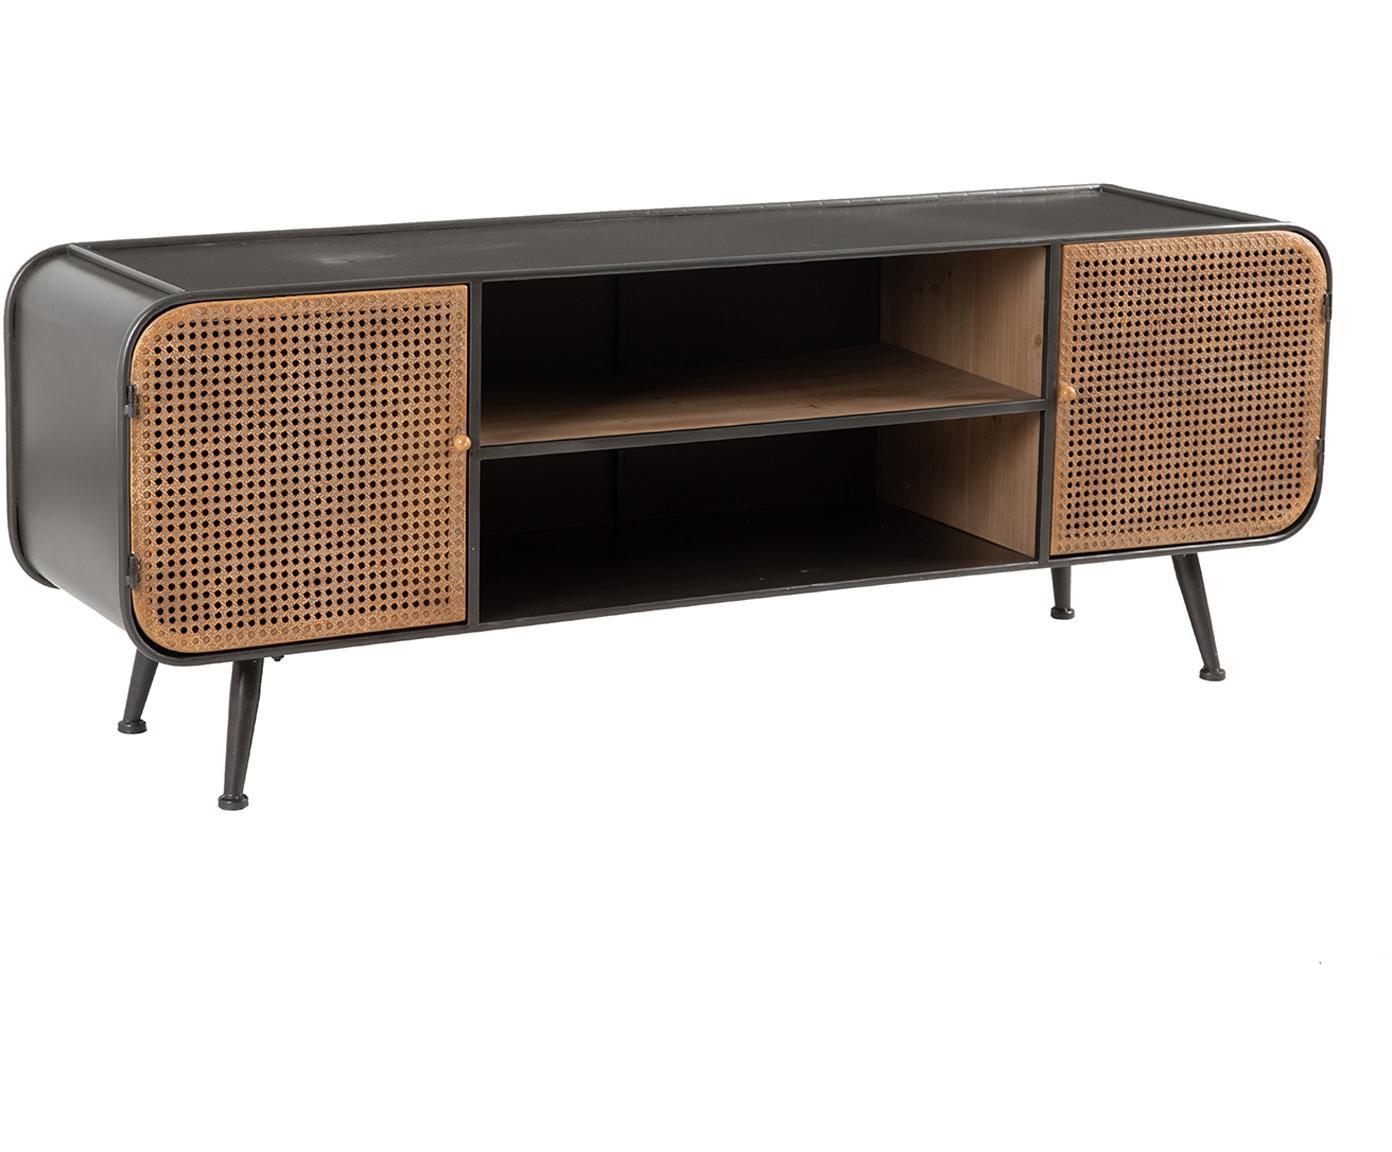 Mueble TV Dugun, Marrón, negro, An 150 x Al 55 cm